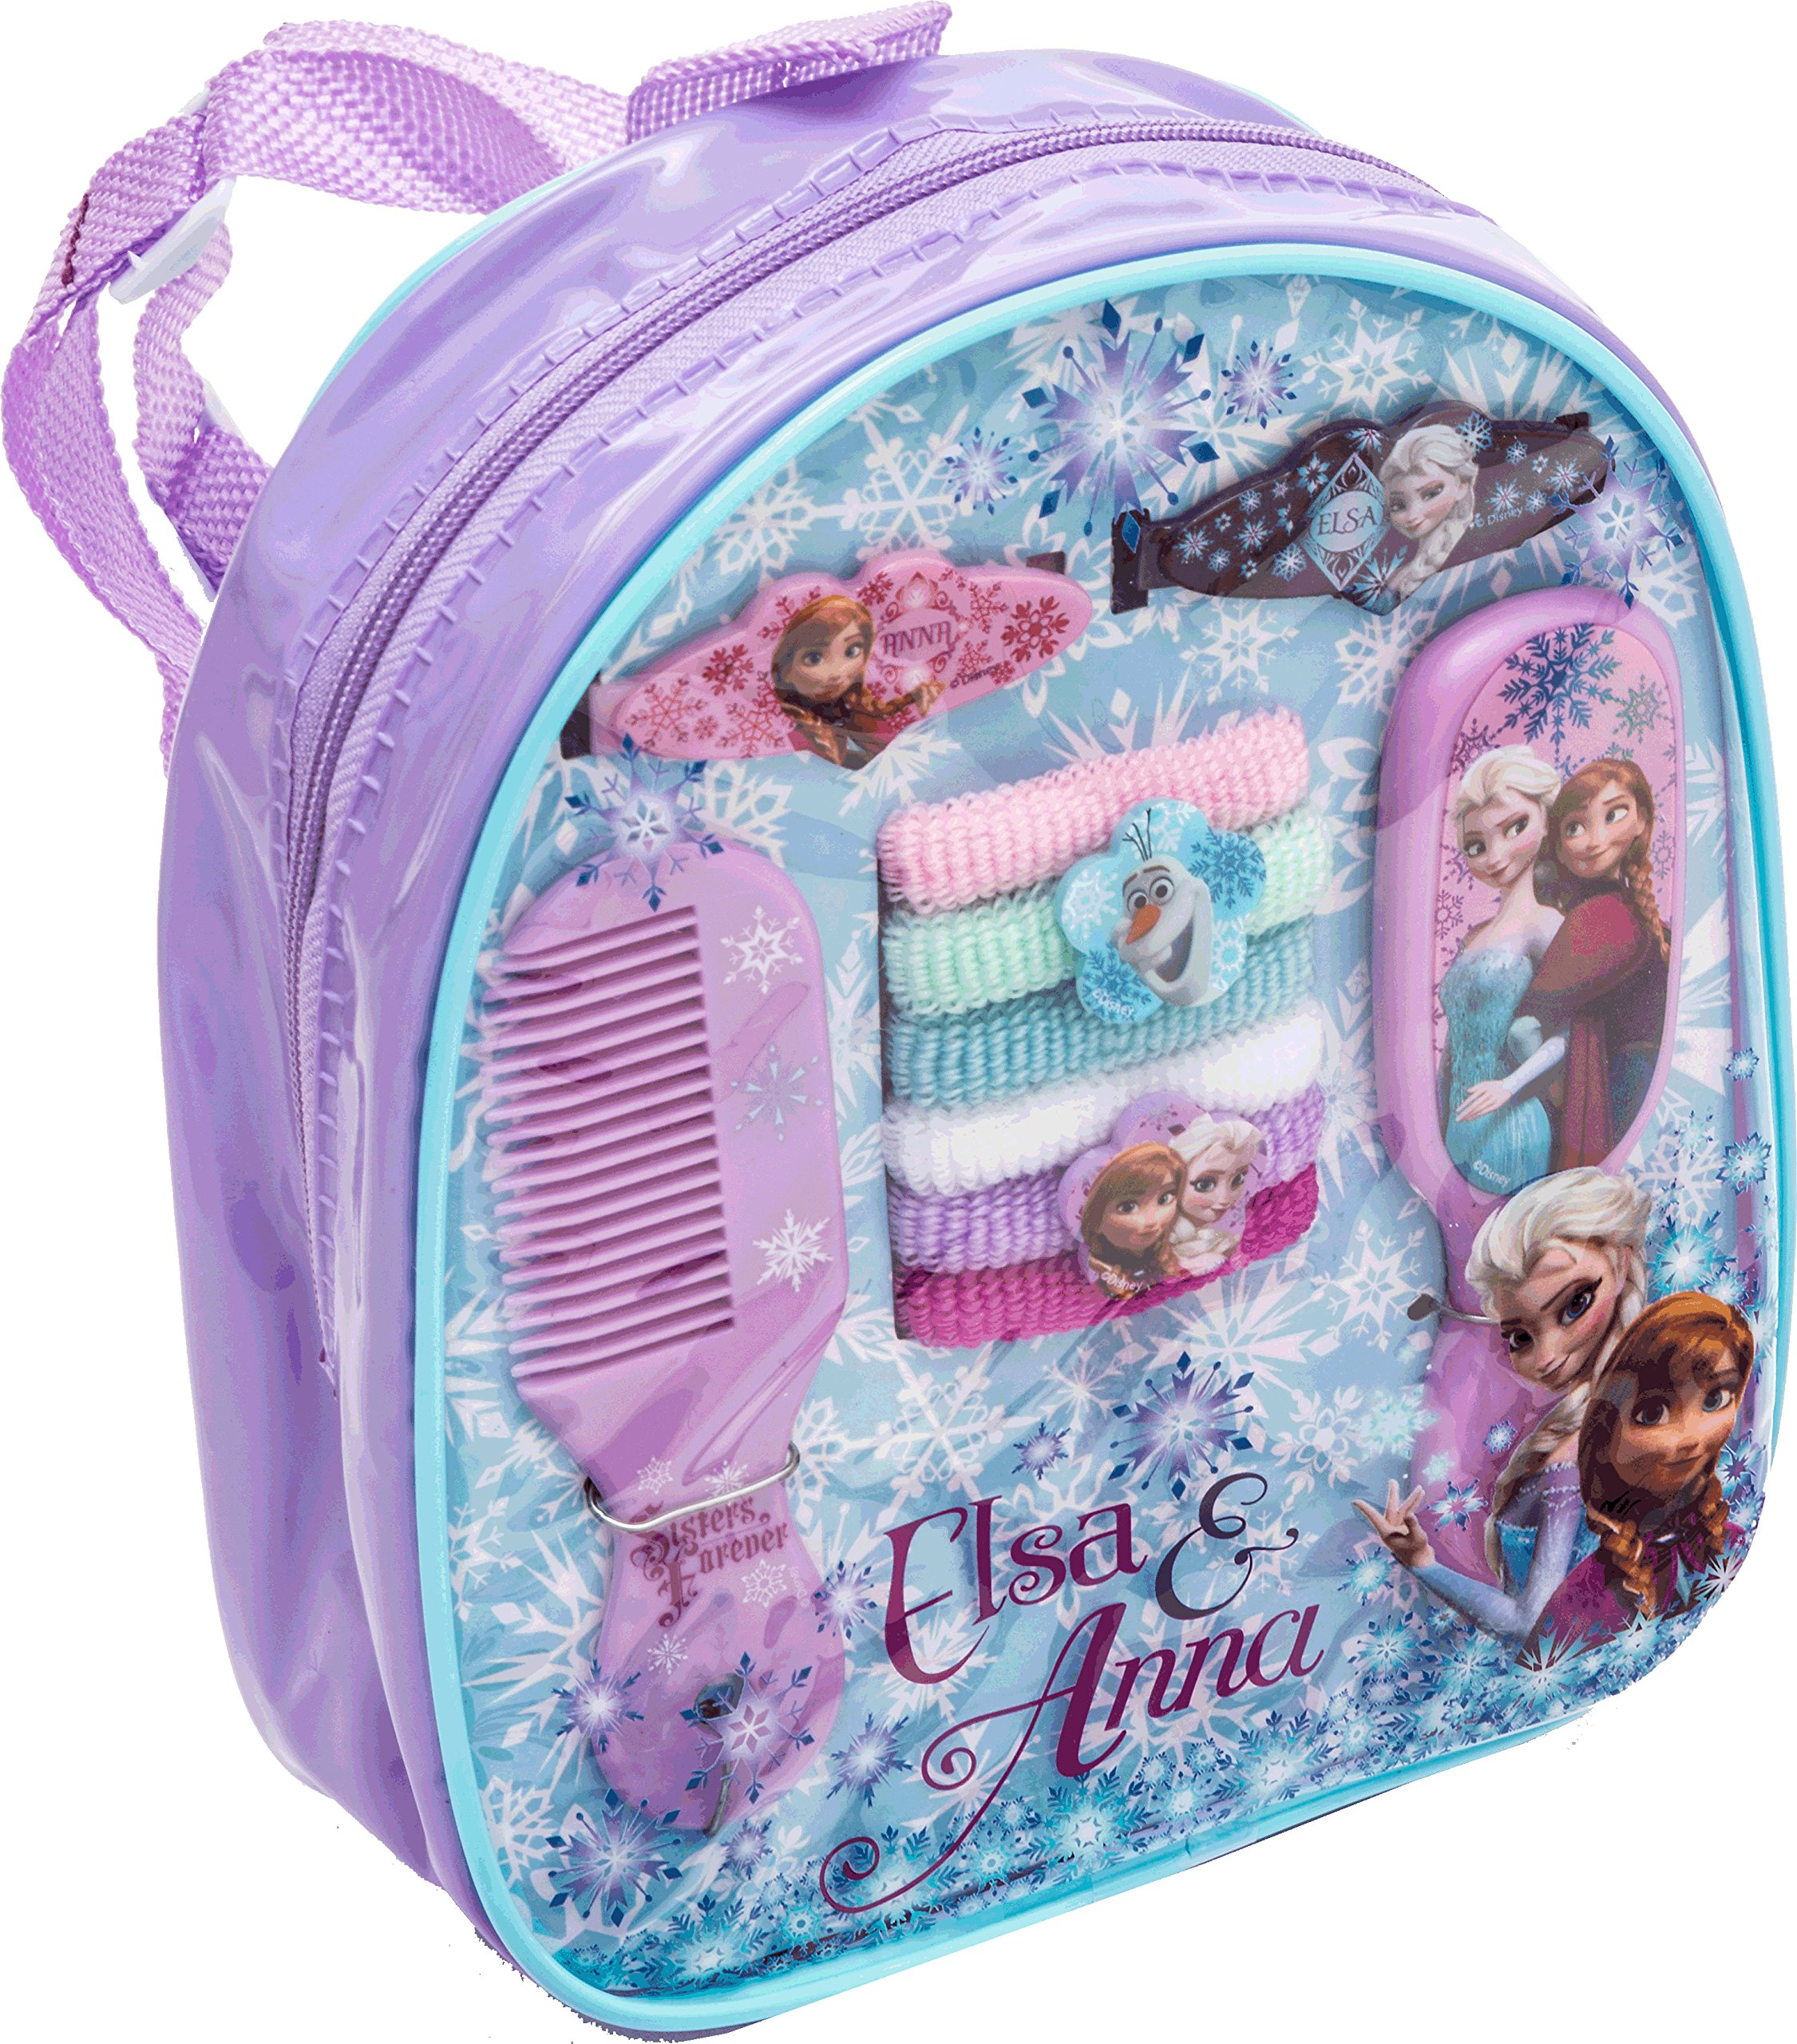 Townley Girl Disney Princess Non Toxic Peel Off Nail: Amazon.com: Townley Girl Disney Frozen Beauty Kit, Lip